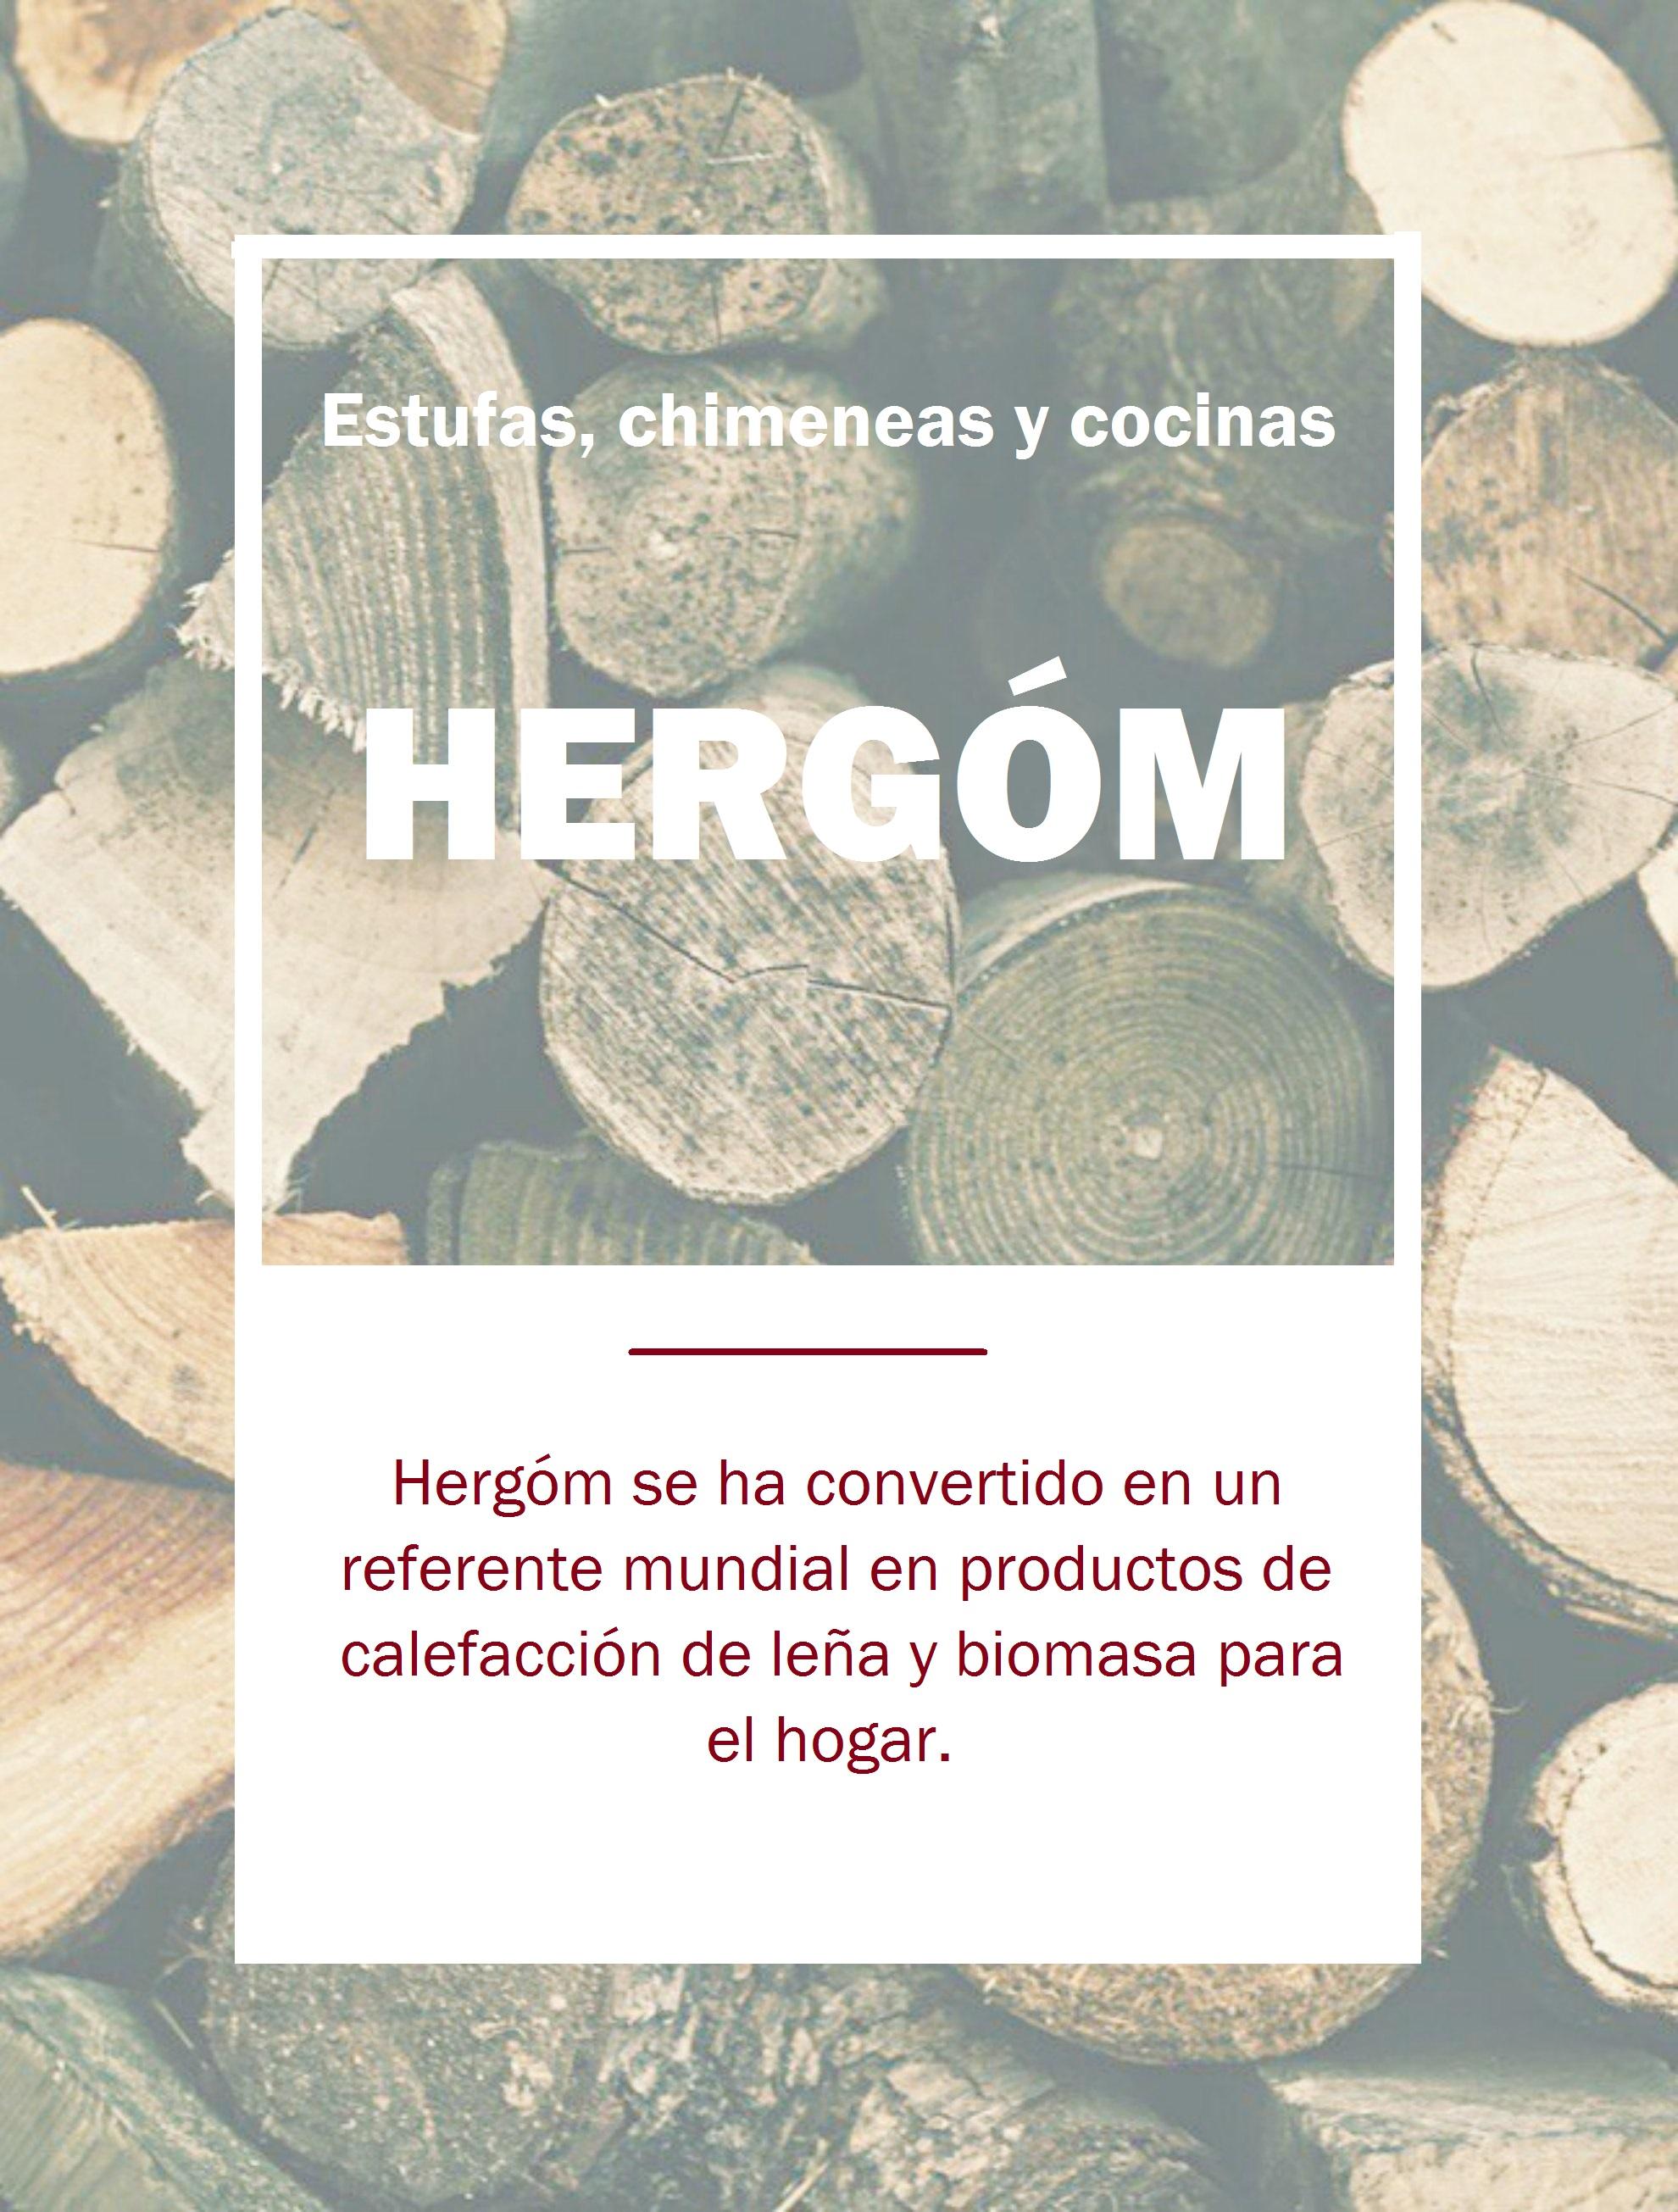 Hergóm: Estufas, hogares y chimeneas